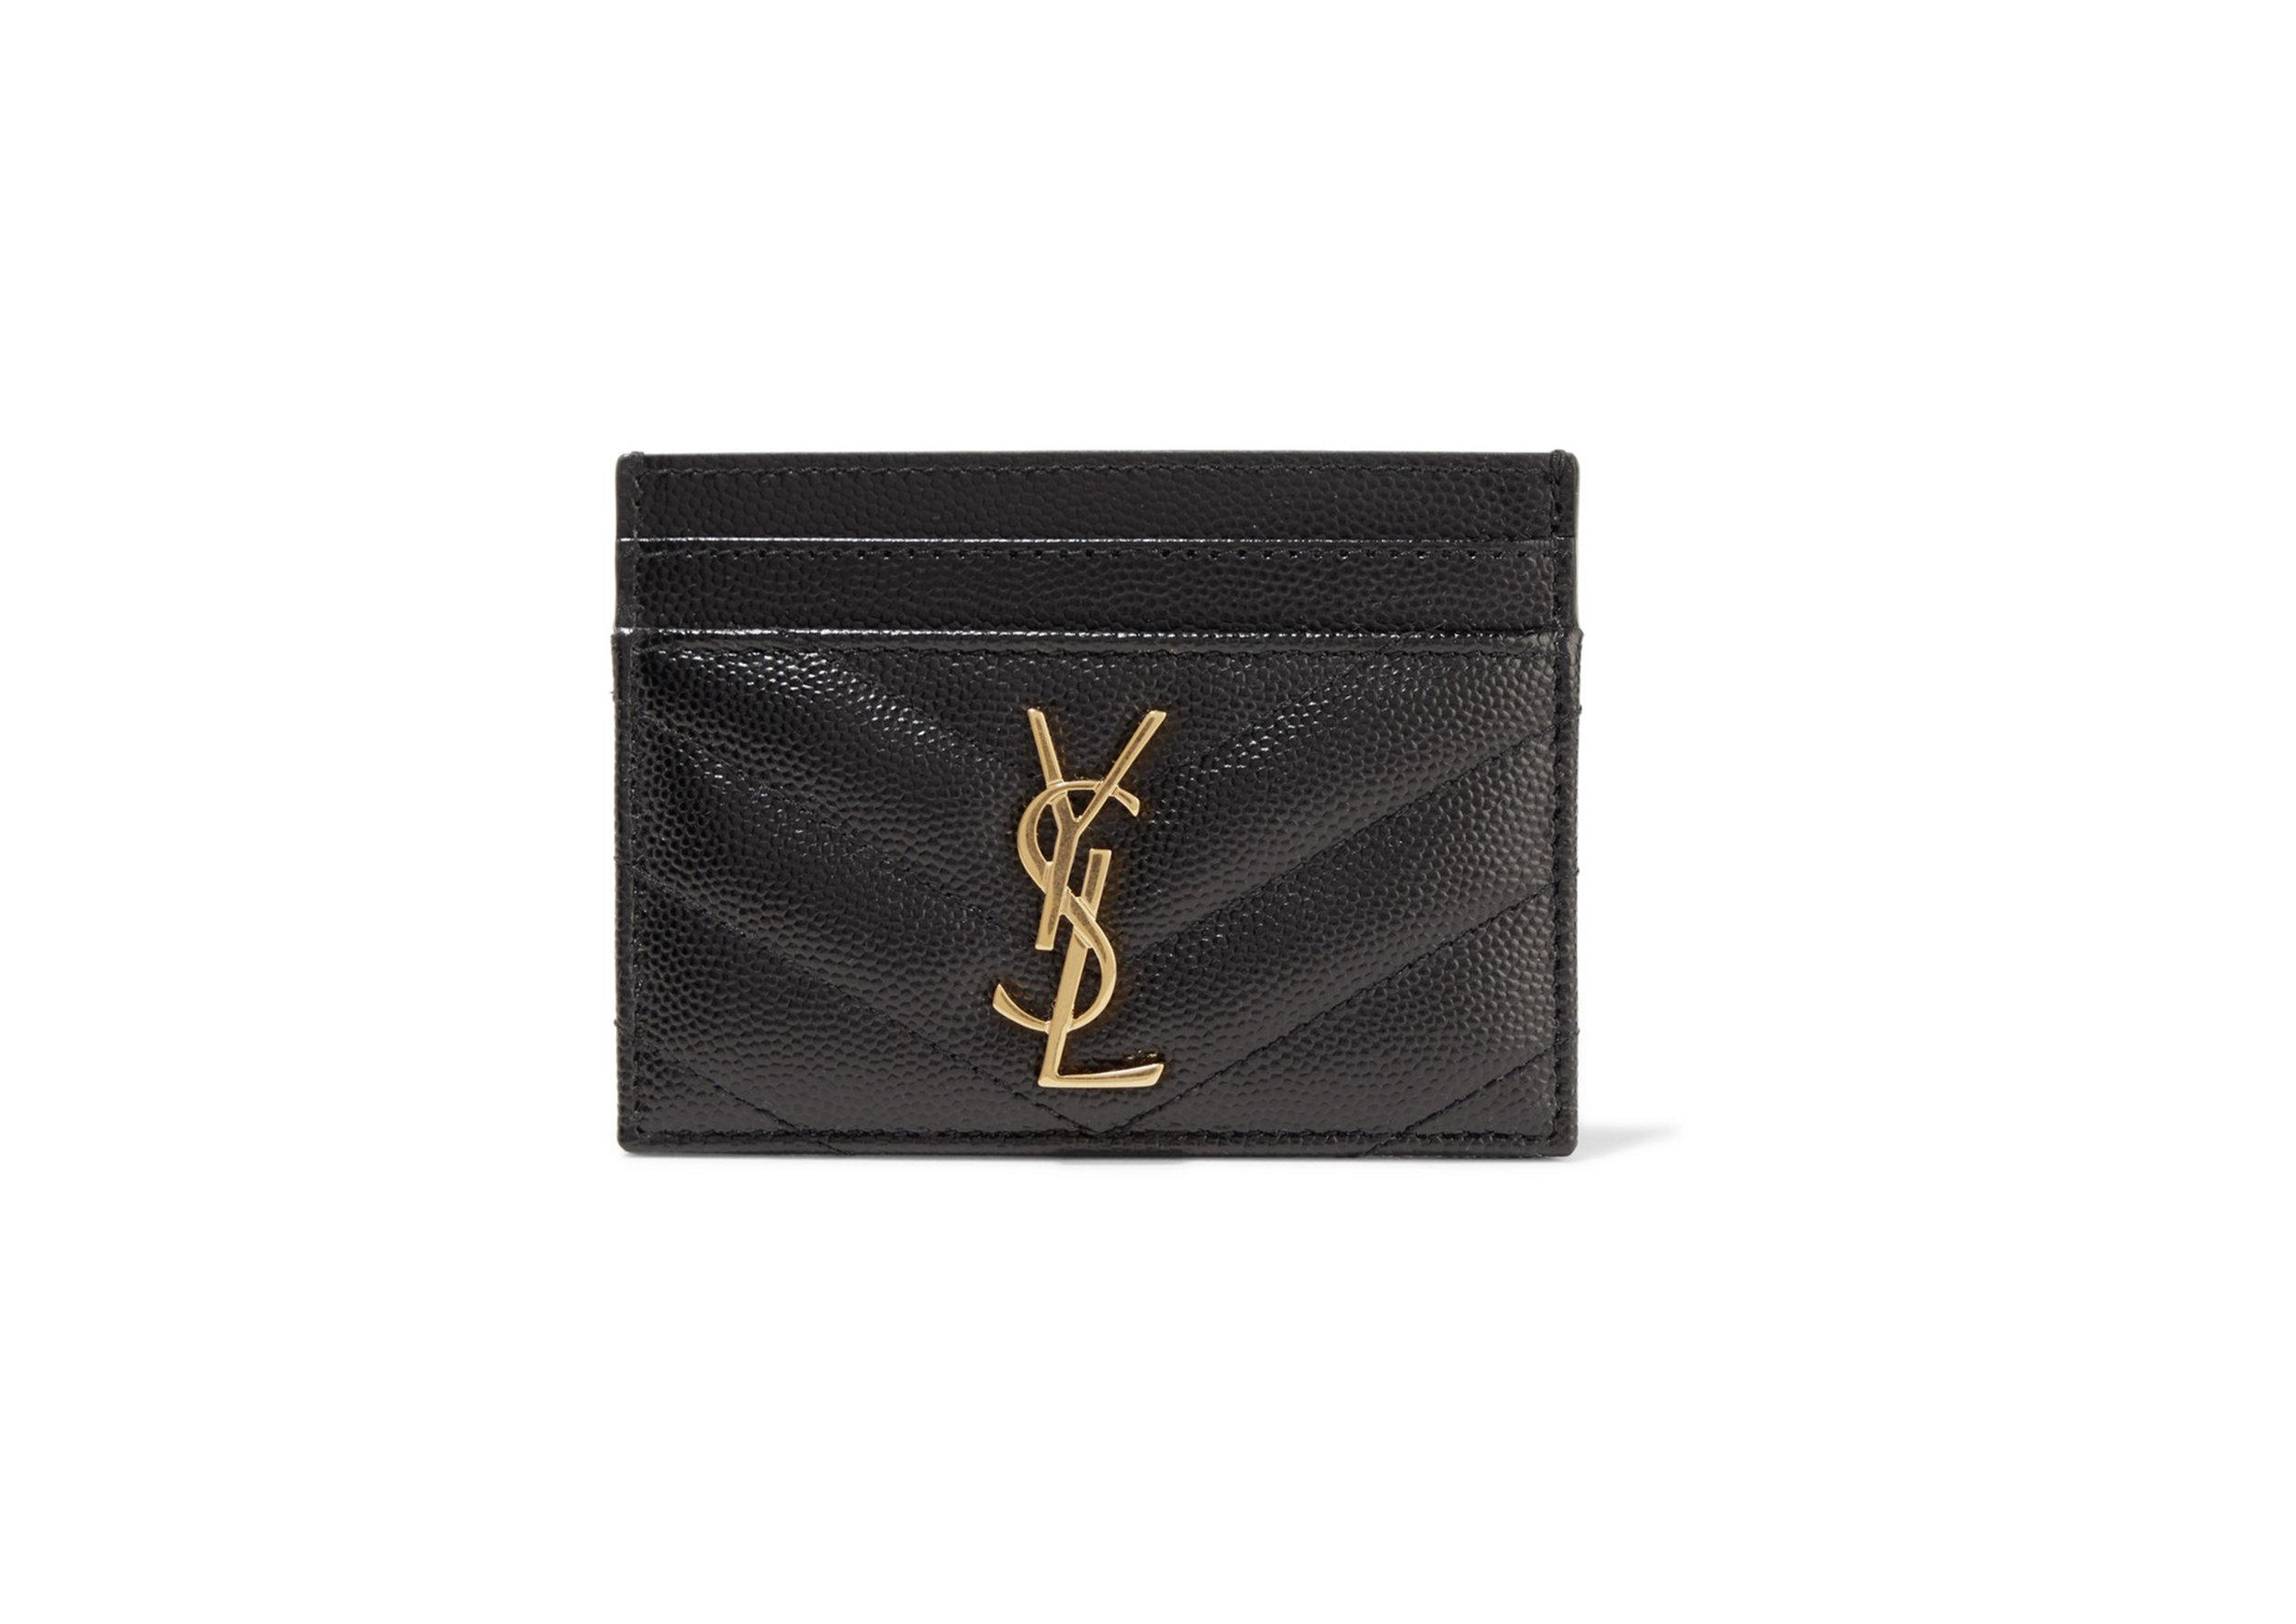 YSL Wallet.jpg